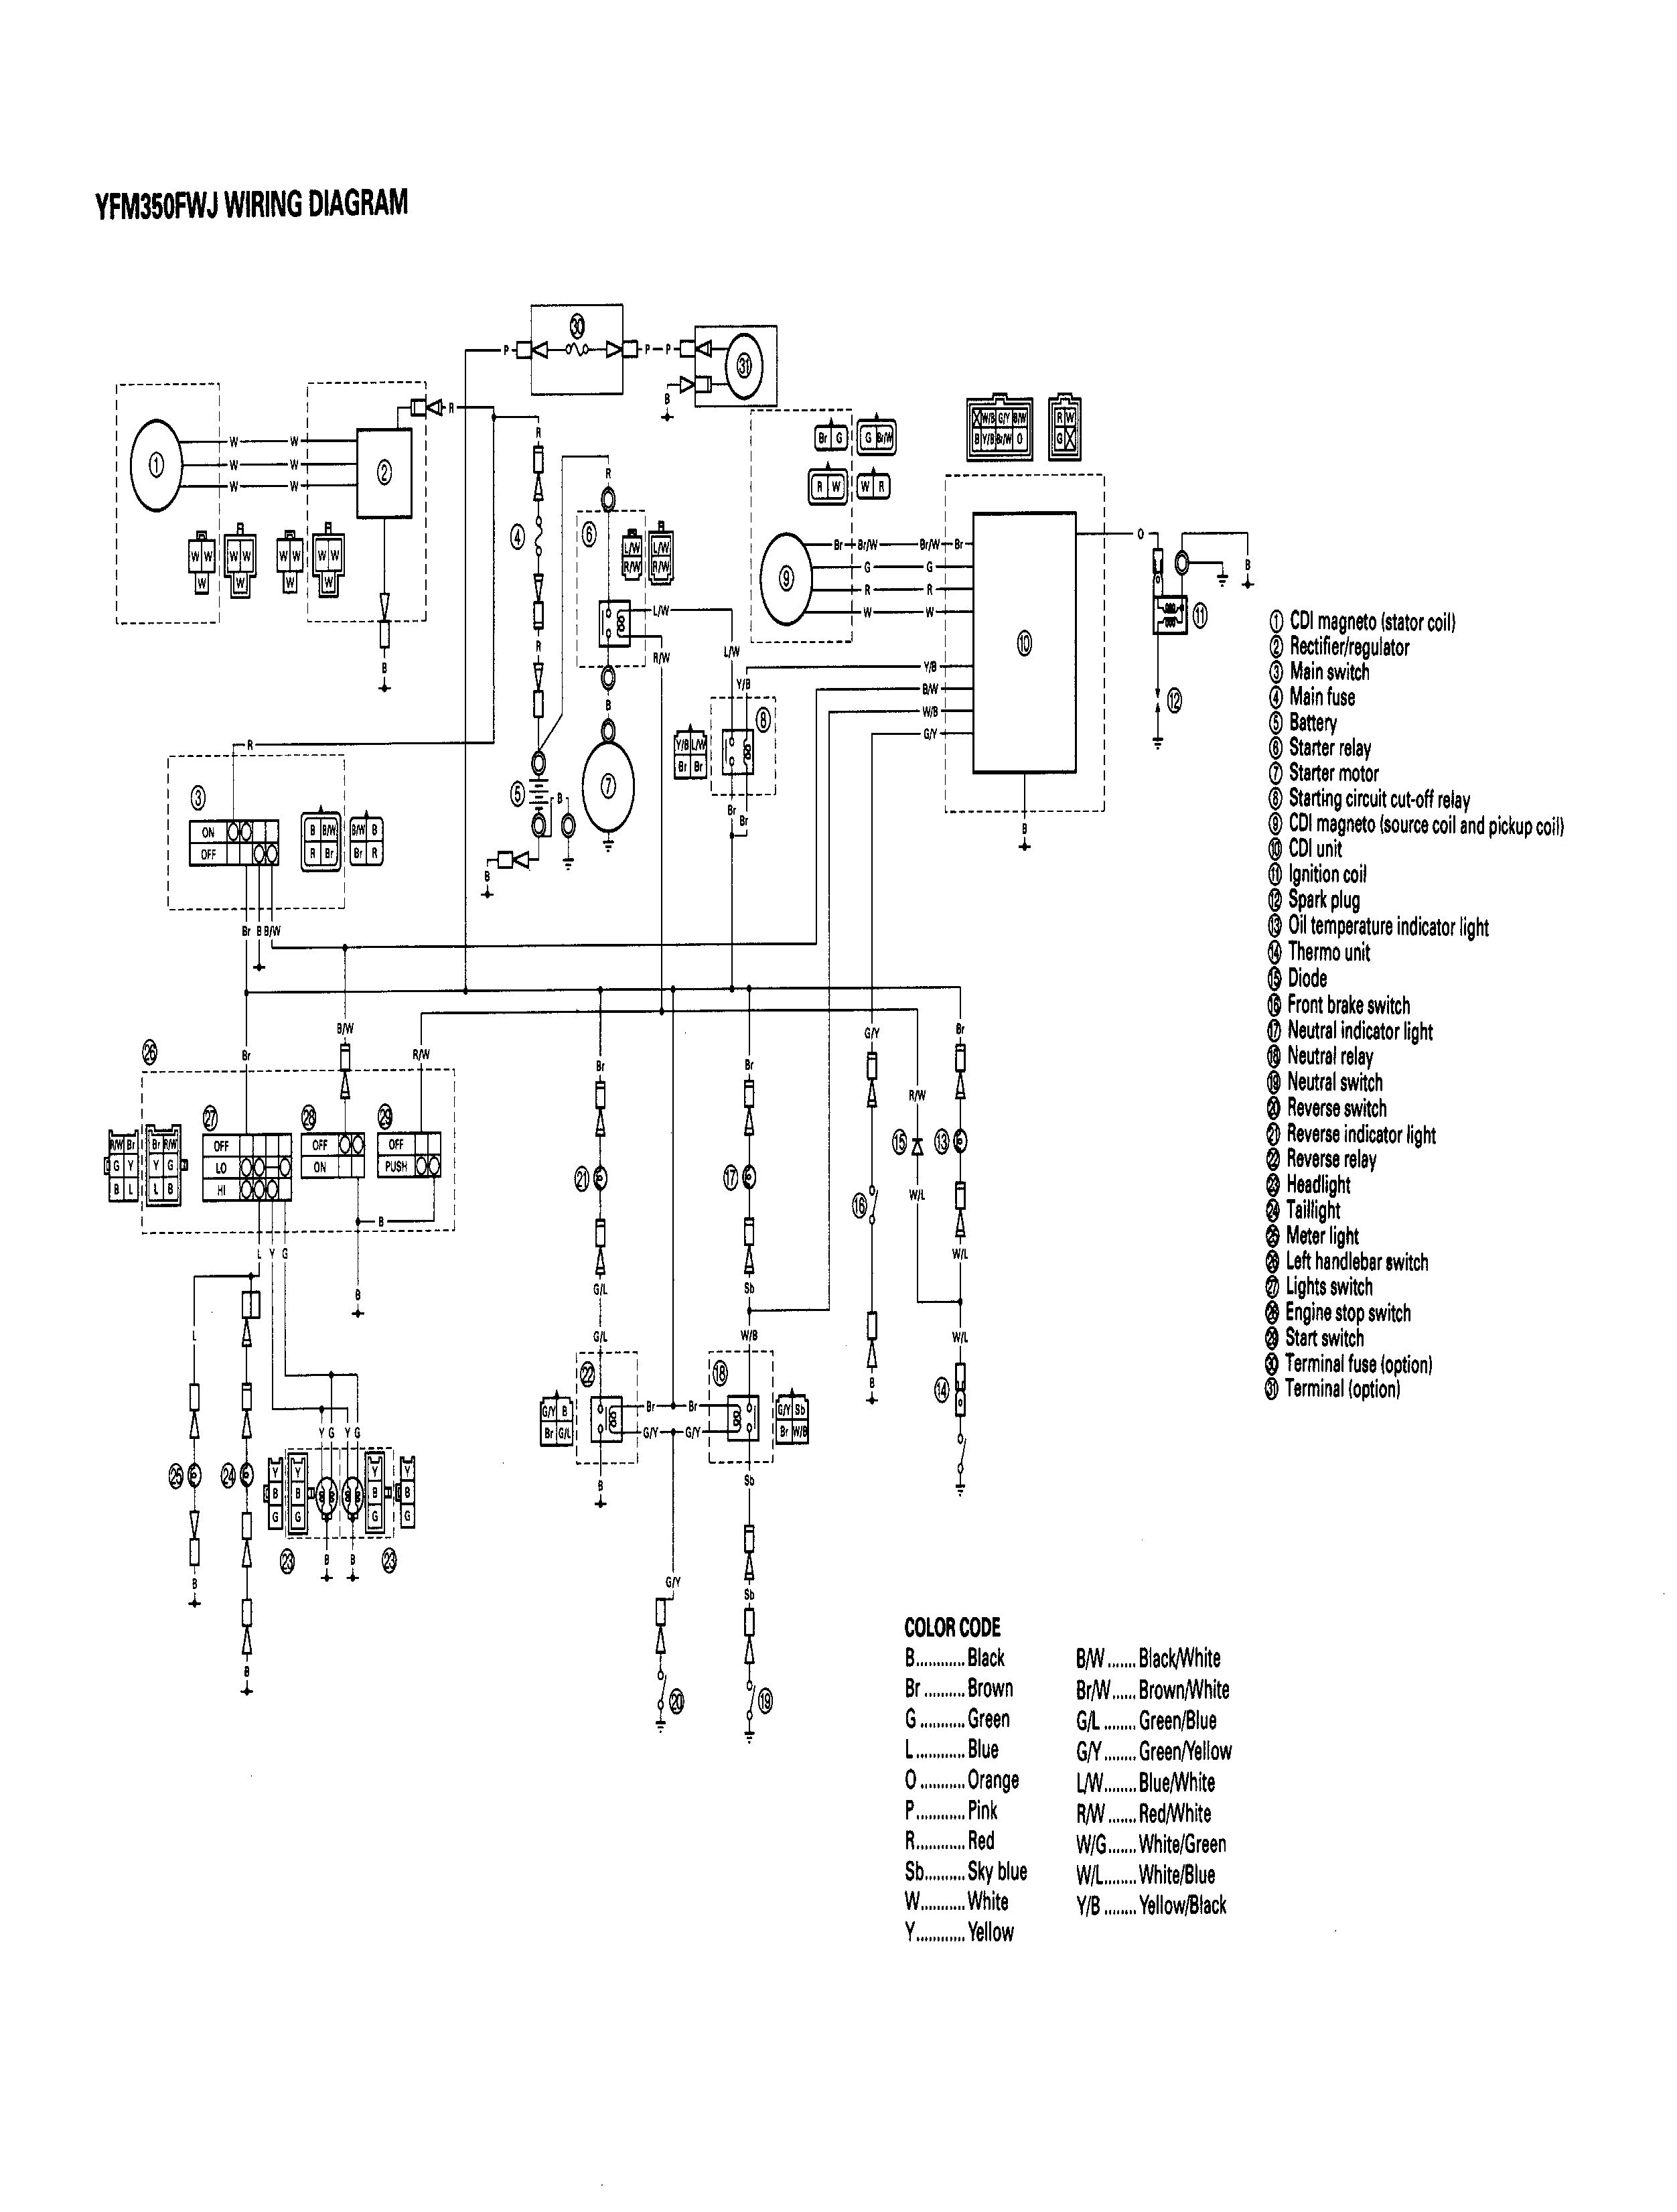 Wiringdiagram Yamaha Big Bear 350 Yamaha Warrior 350 Wiring Specs Wiring Diagram Schematic Of Wiringdiagram Yamaha Big Bear 350